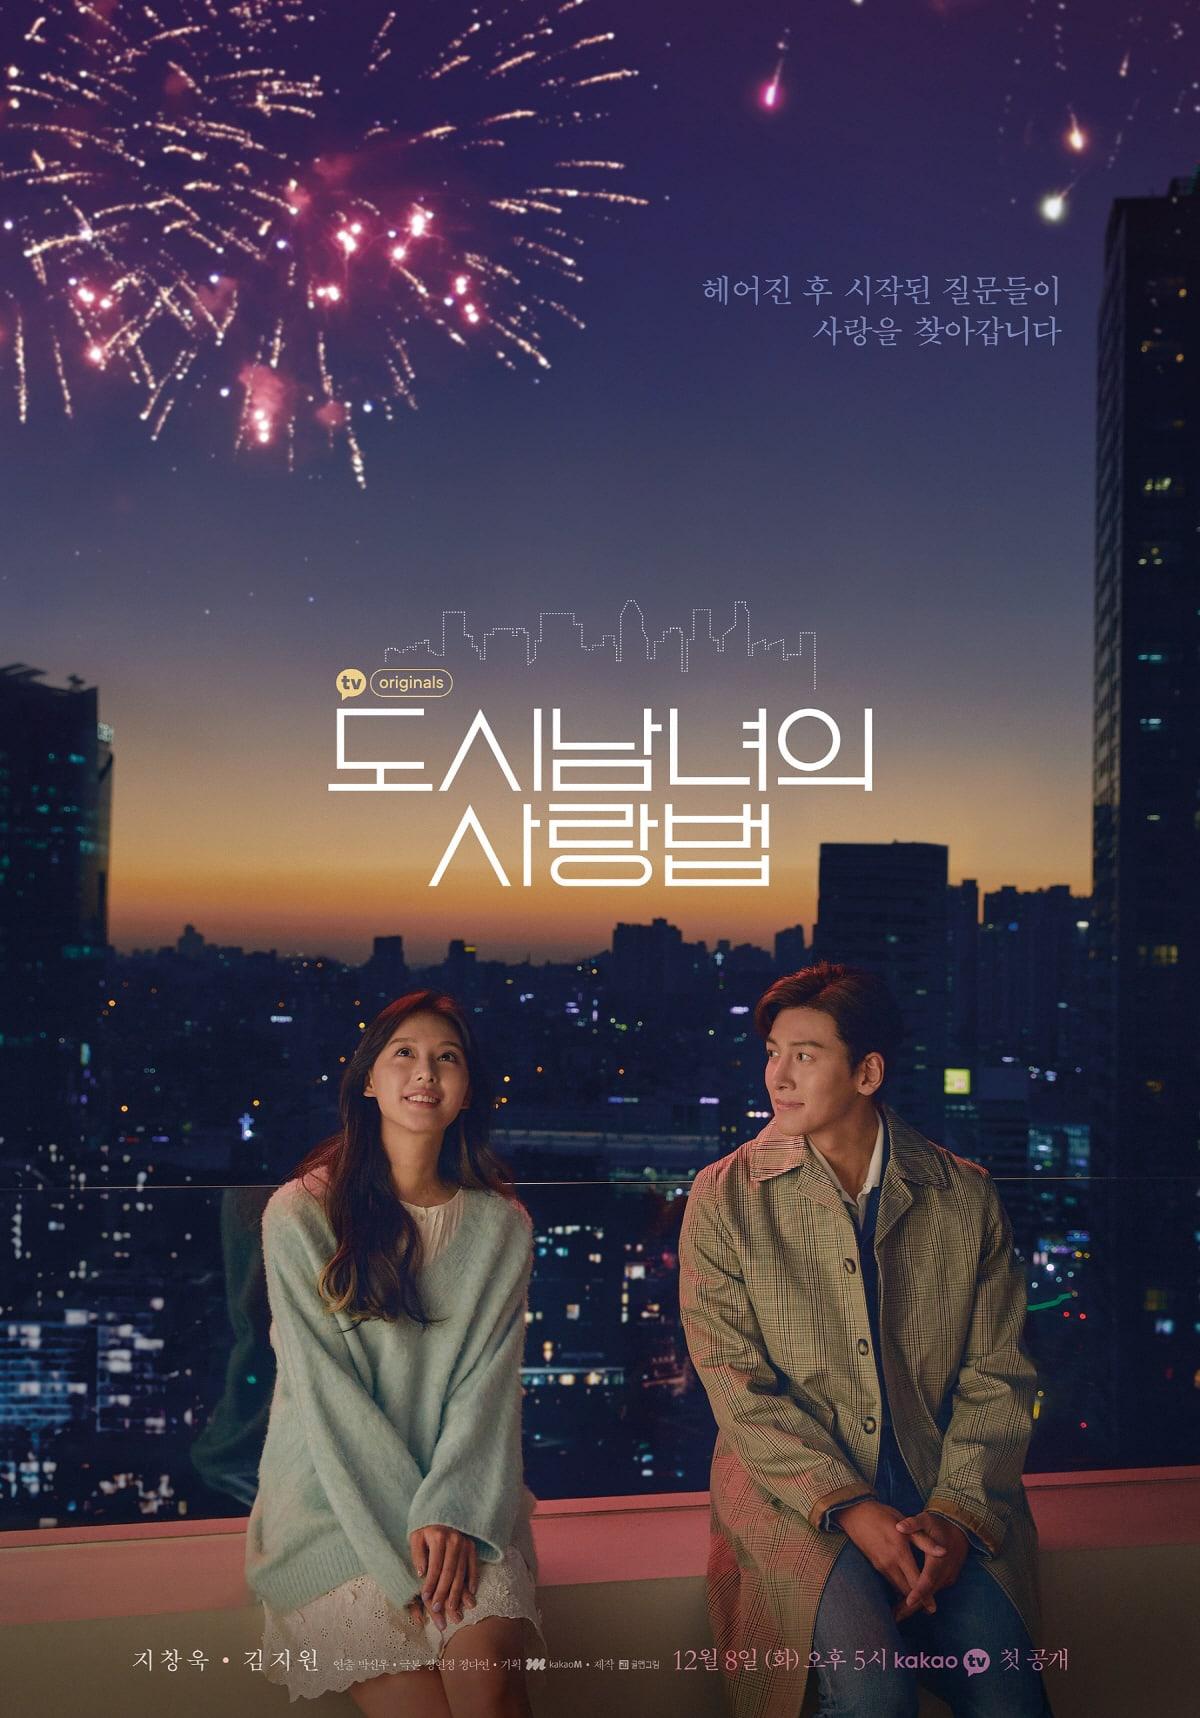 City Couple's Way of Love: Ji Chang Wook and Kim Ji Won's reveal a main romantic poster